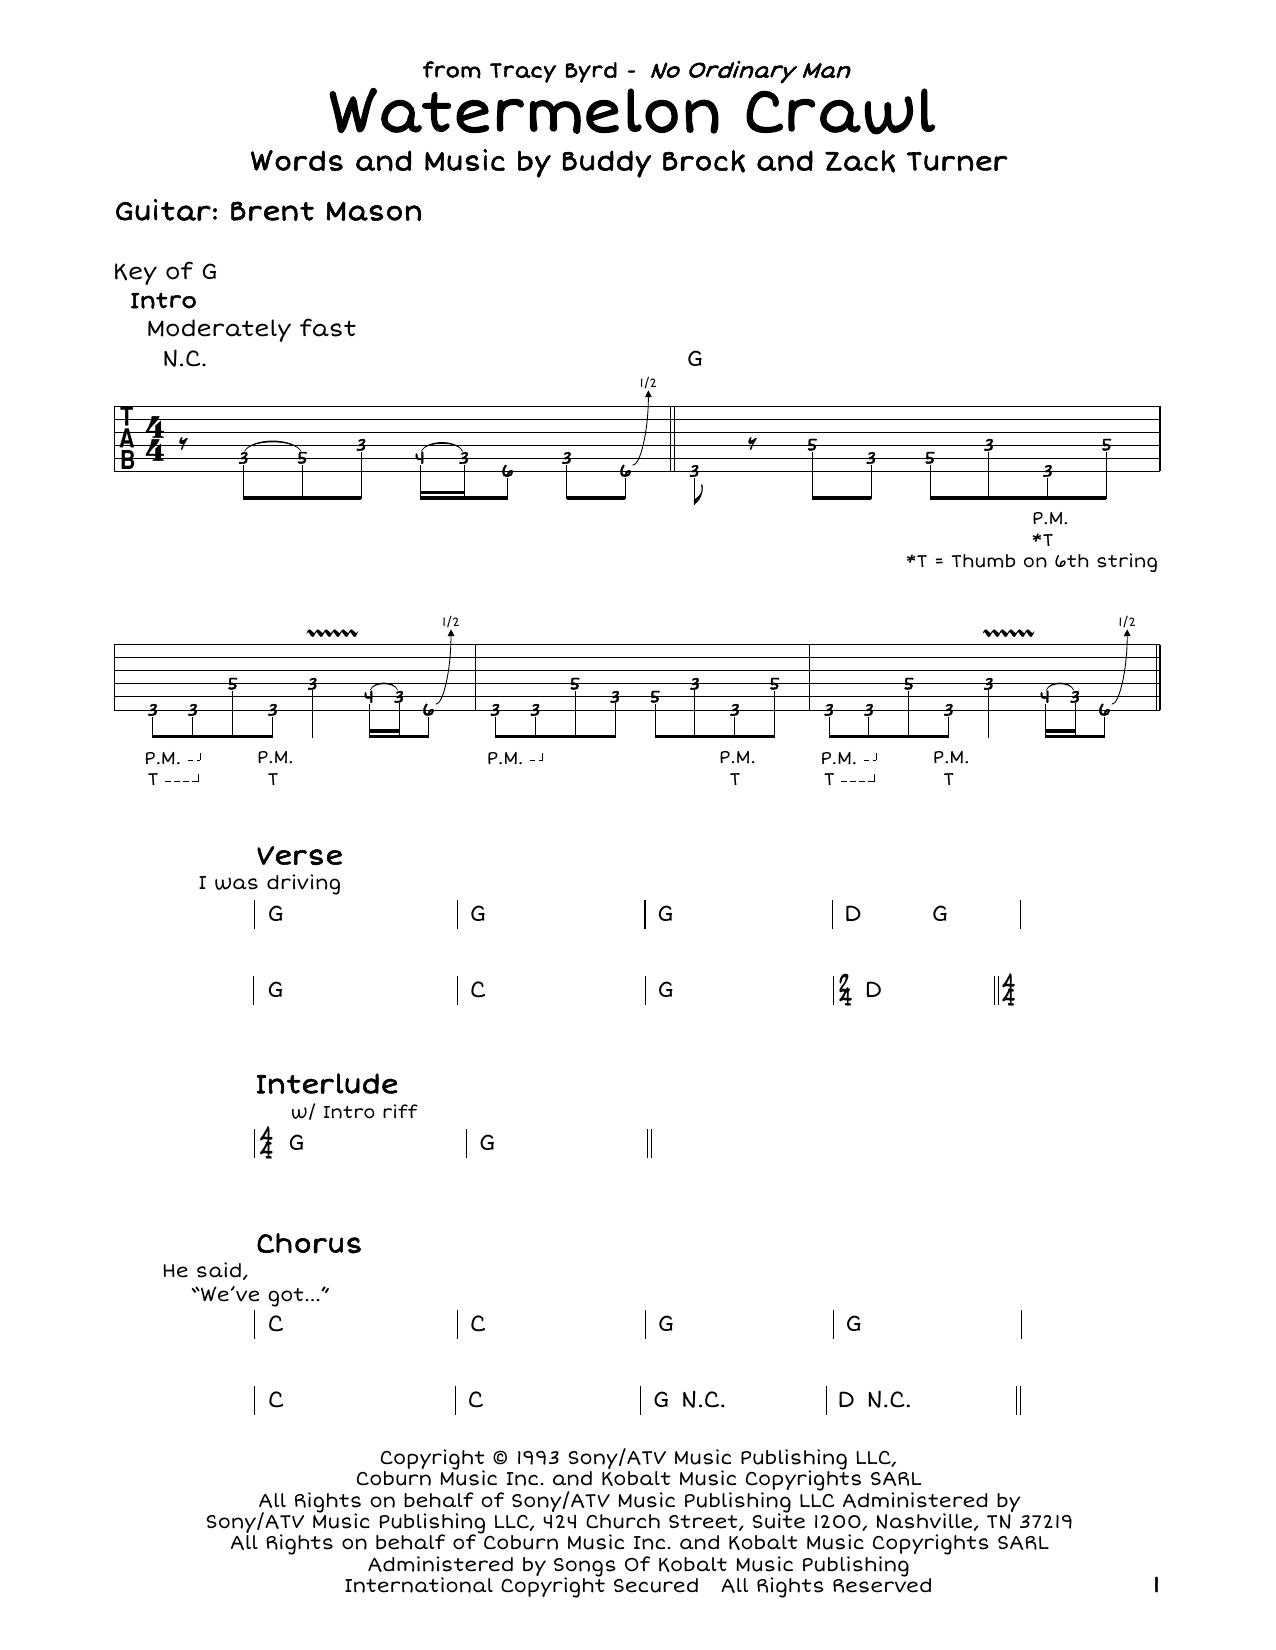 Watermelon Crawl Sheet Music